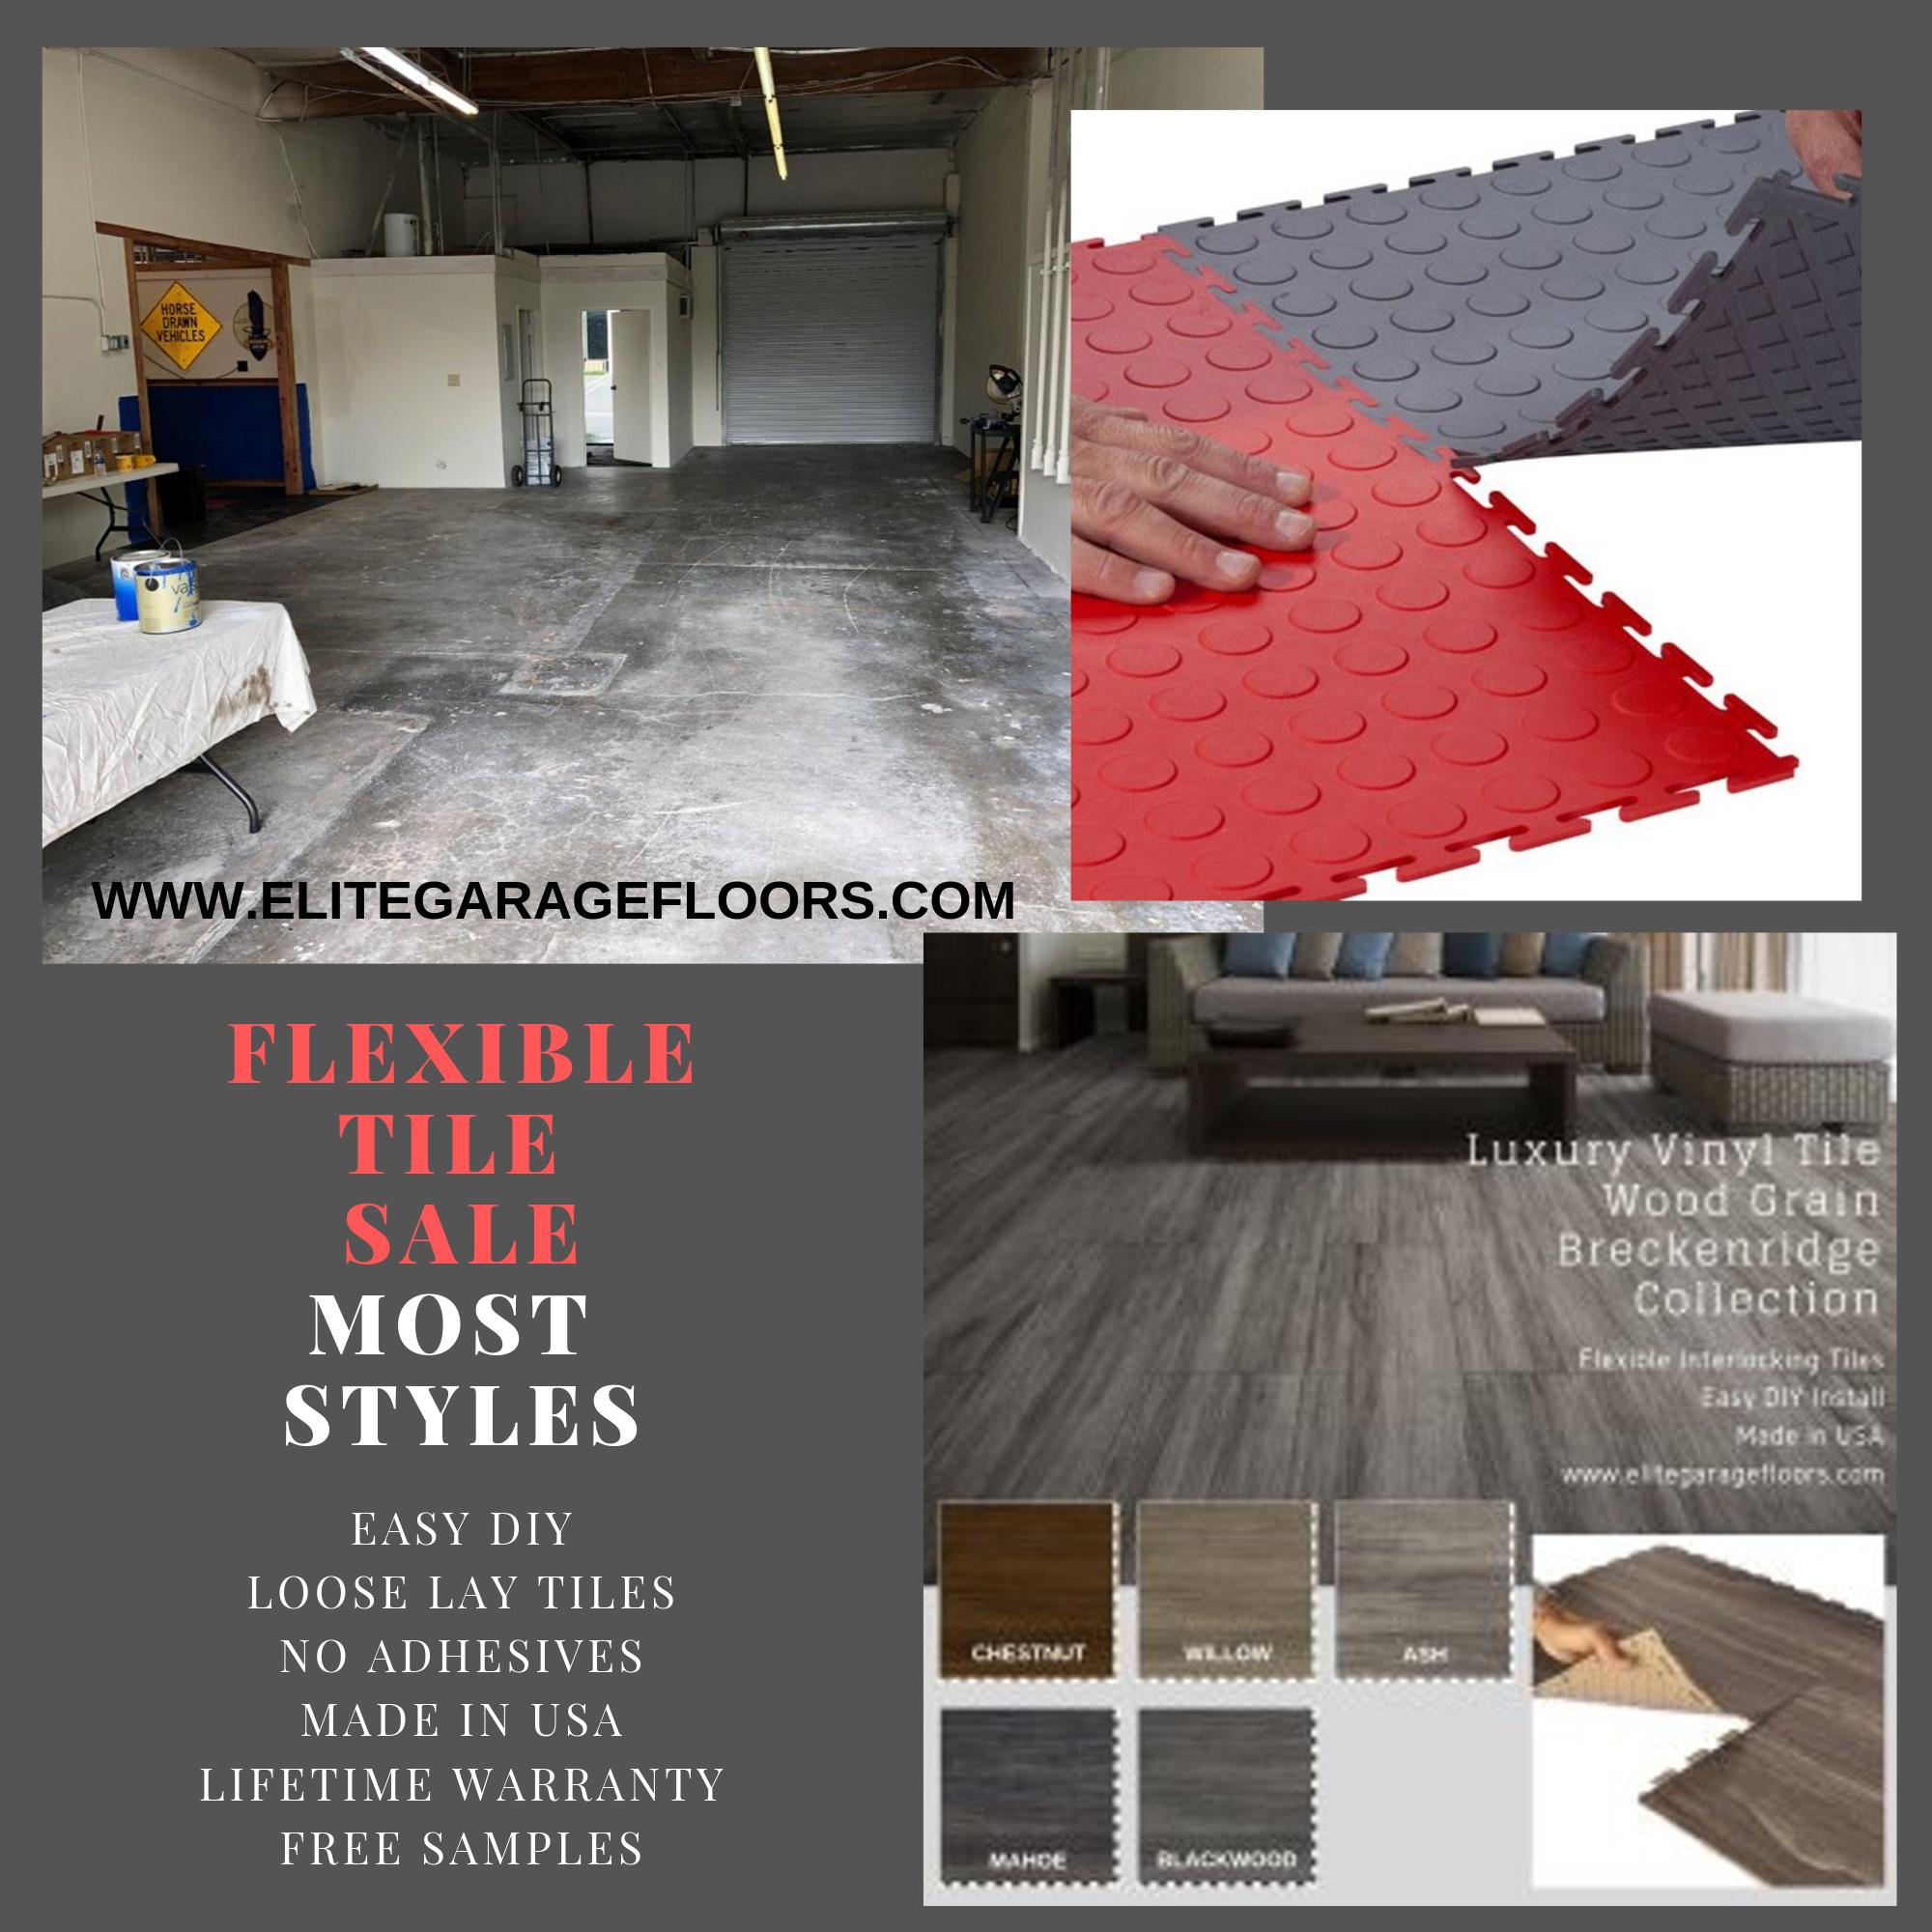 Perfection Floor Tile Sale Basement Remodel Diy Tiles For Sale Basement Remodeling